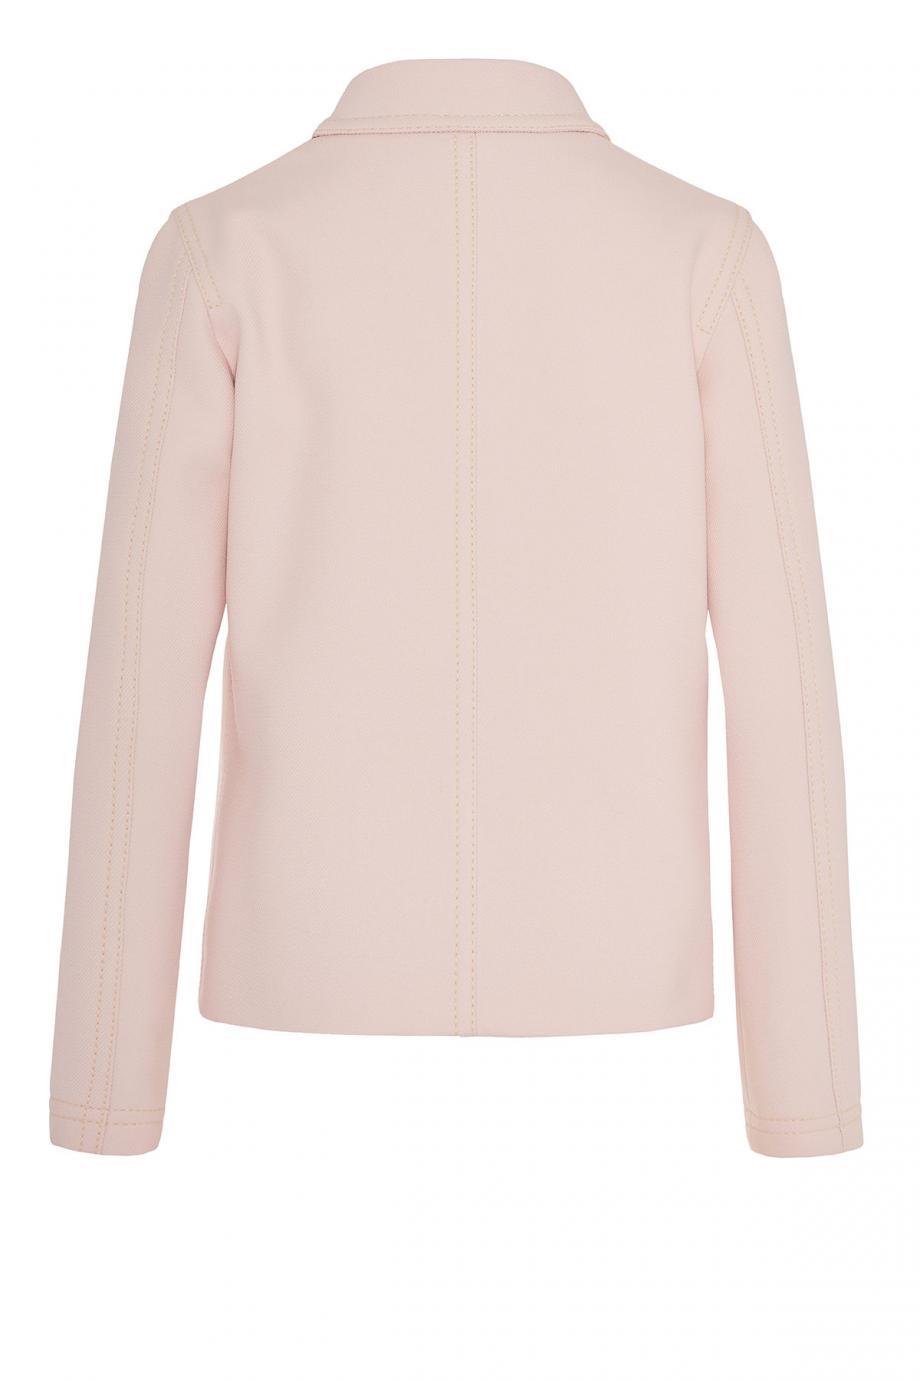 Embellished crepe jacket